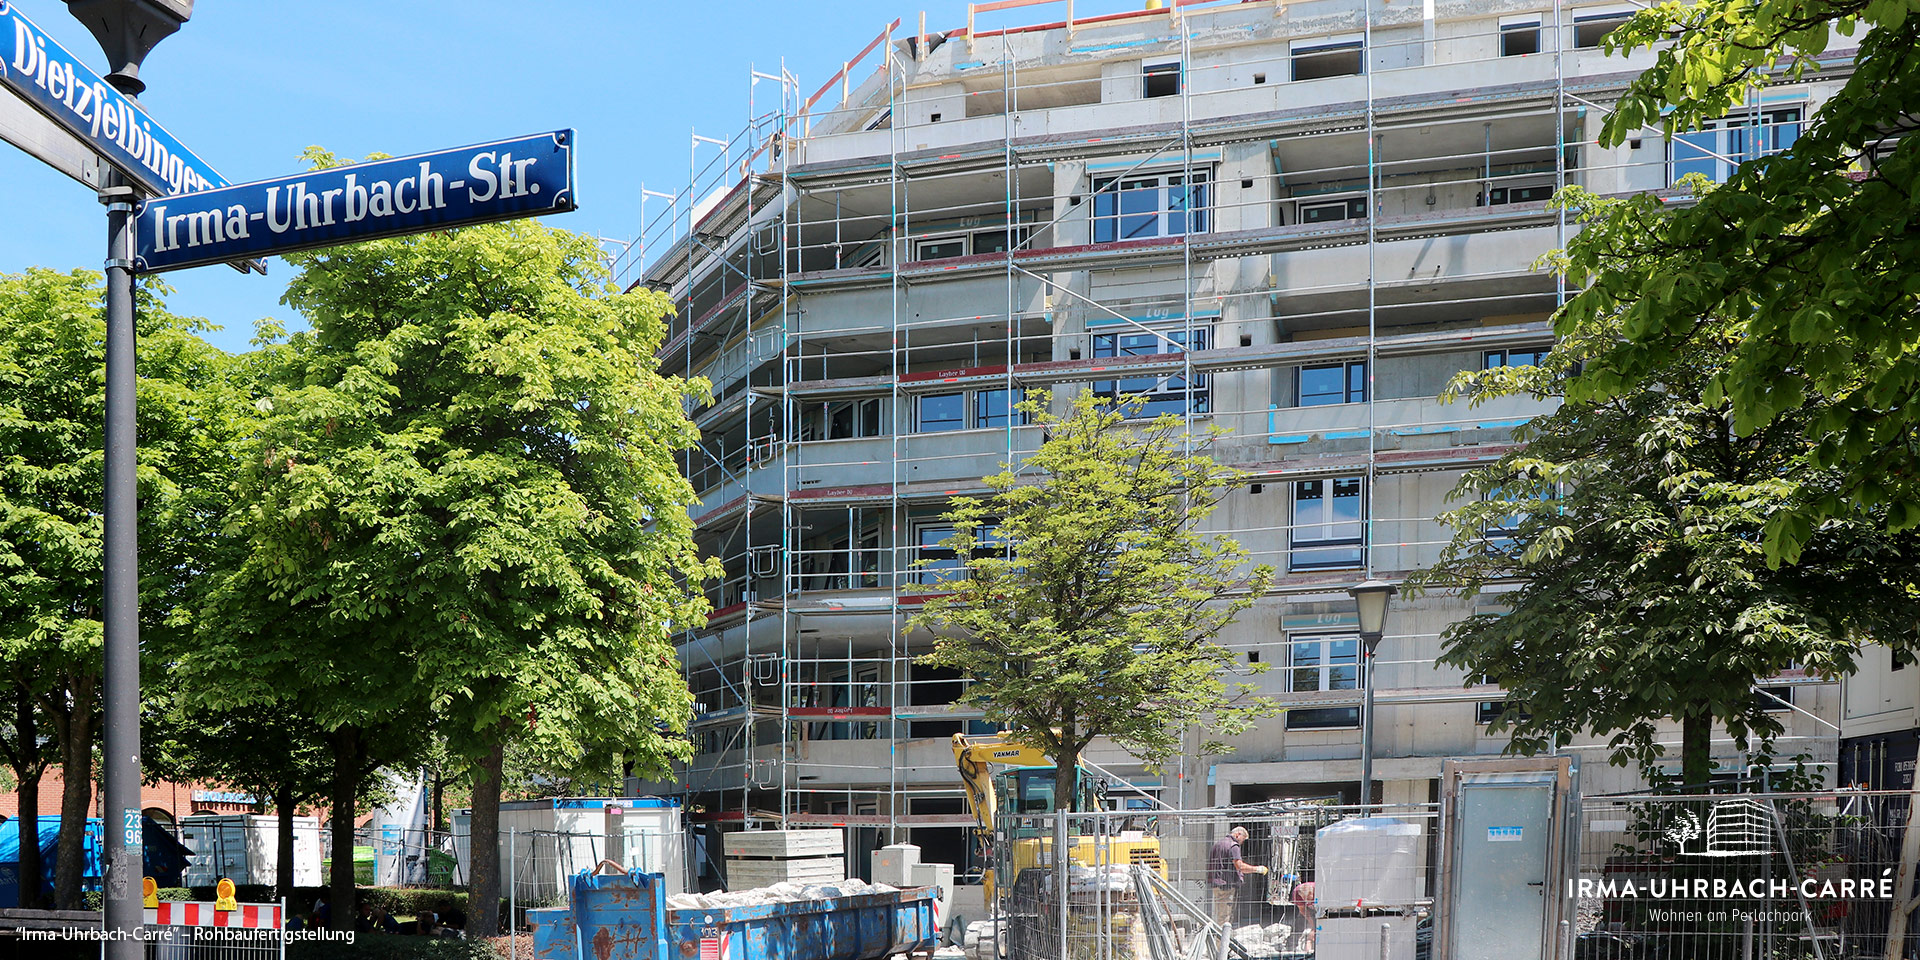 """Irma-Uhrbach-Carré"" in München-Perlach-Süd: Rohbaufertigstellung"